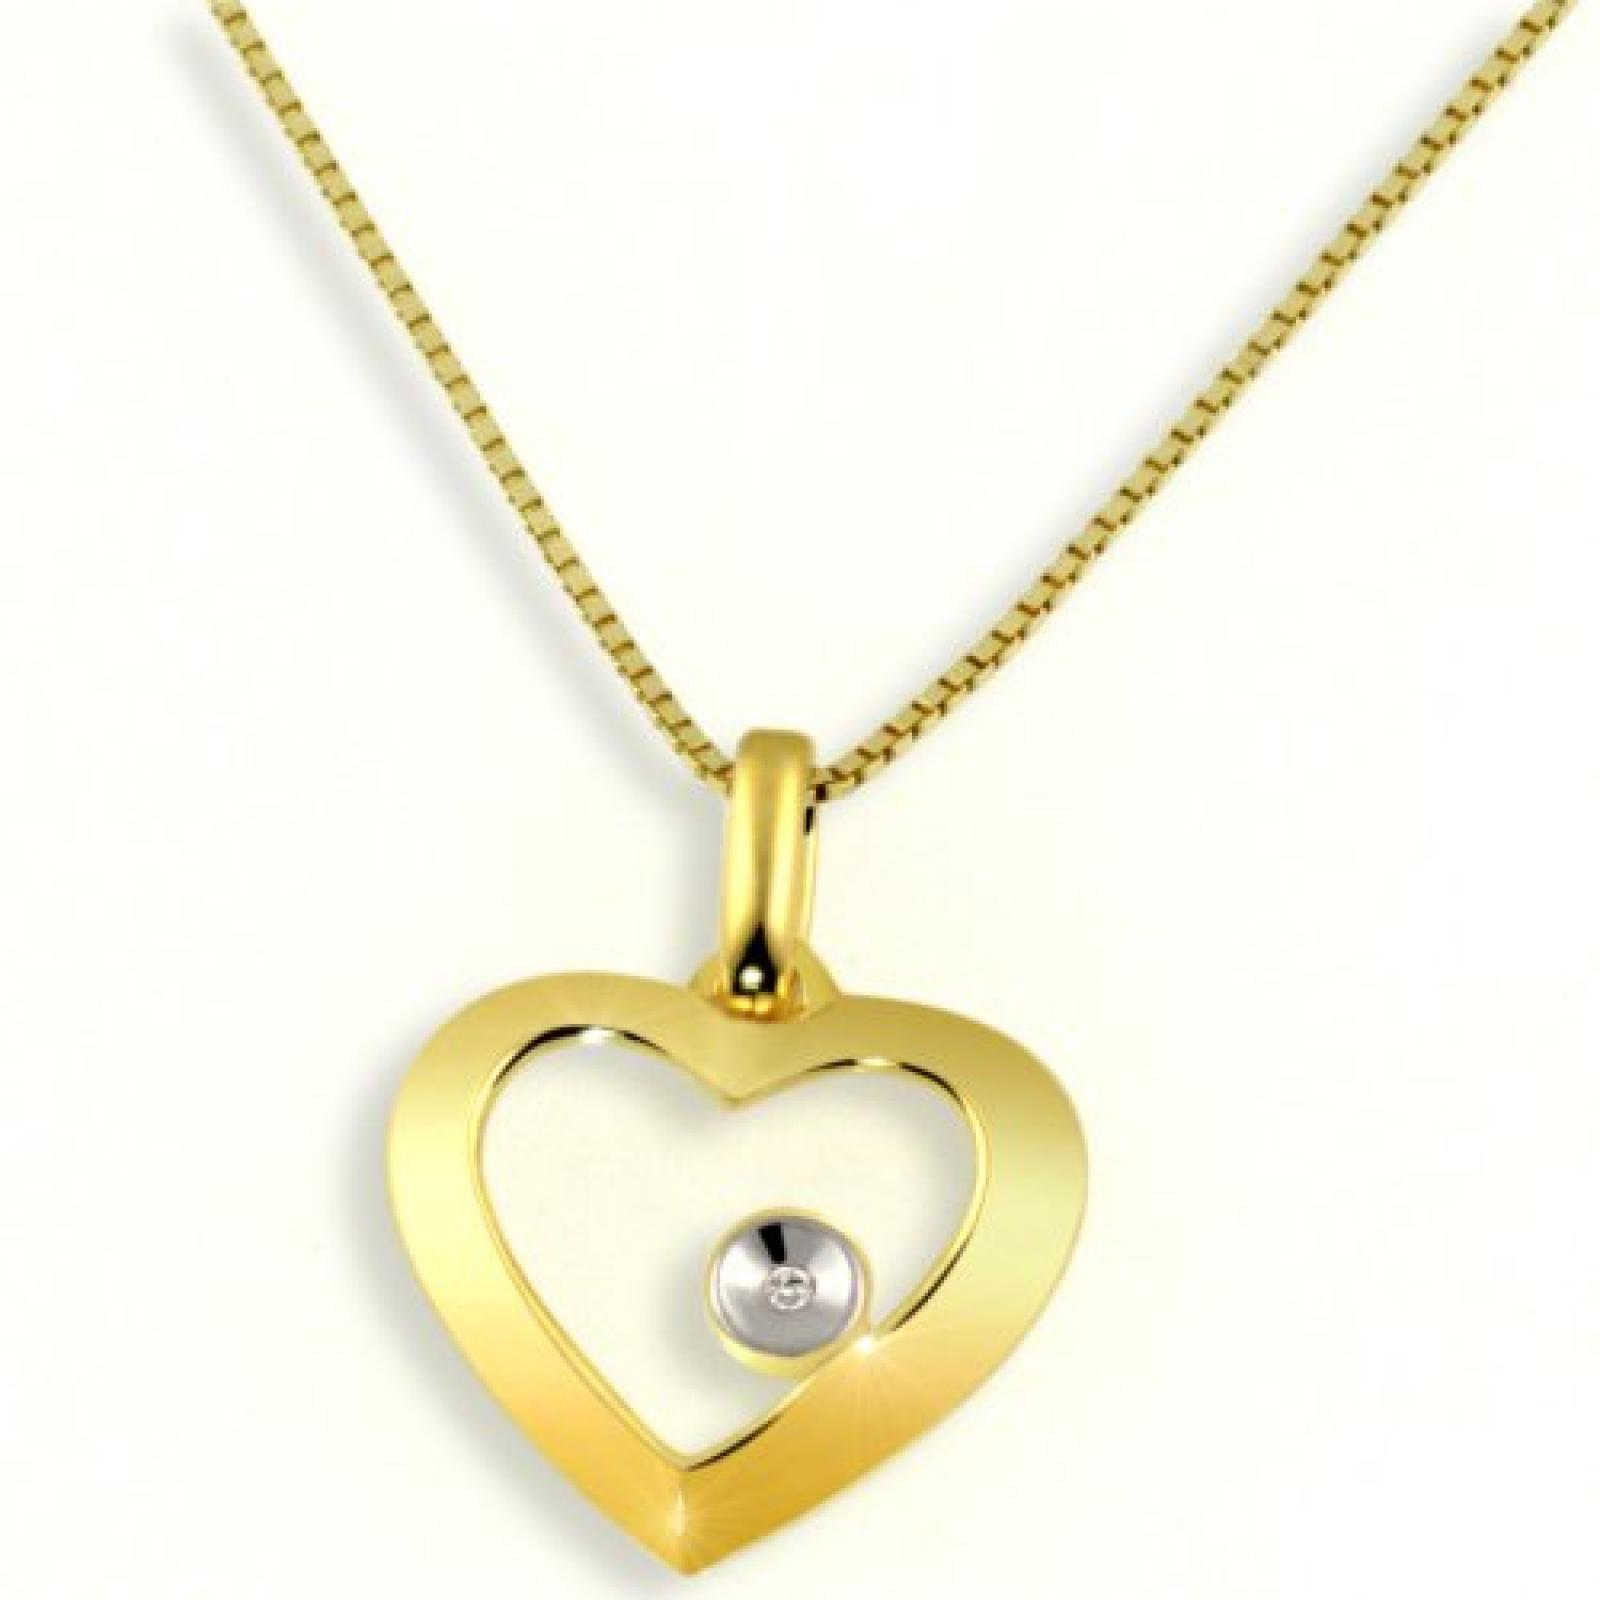 Goldmaid Damen-Collier Herz 585 Gelbgold Diamant 0,005ct  45cm HeC3705GG